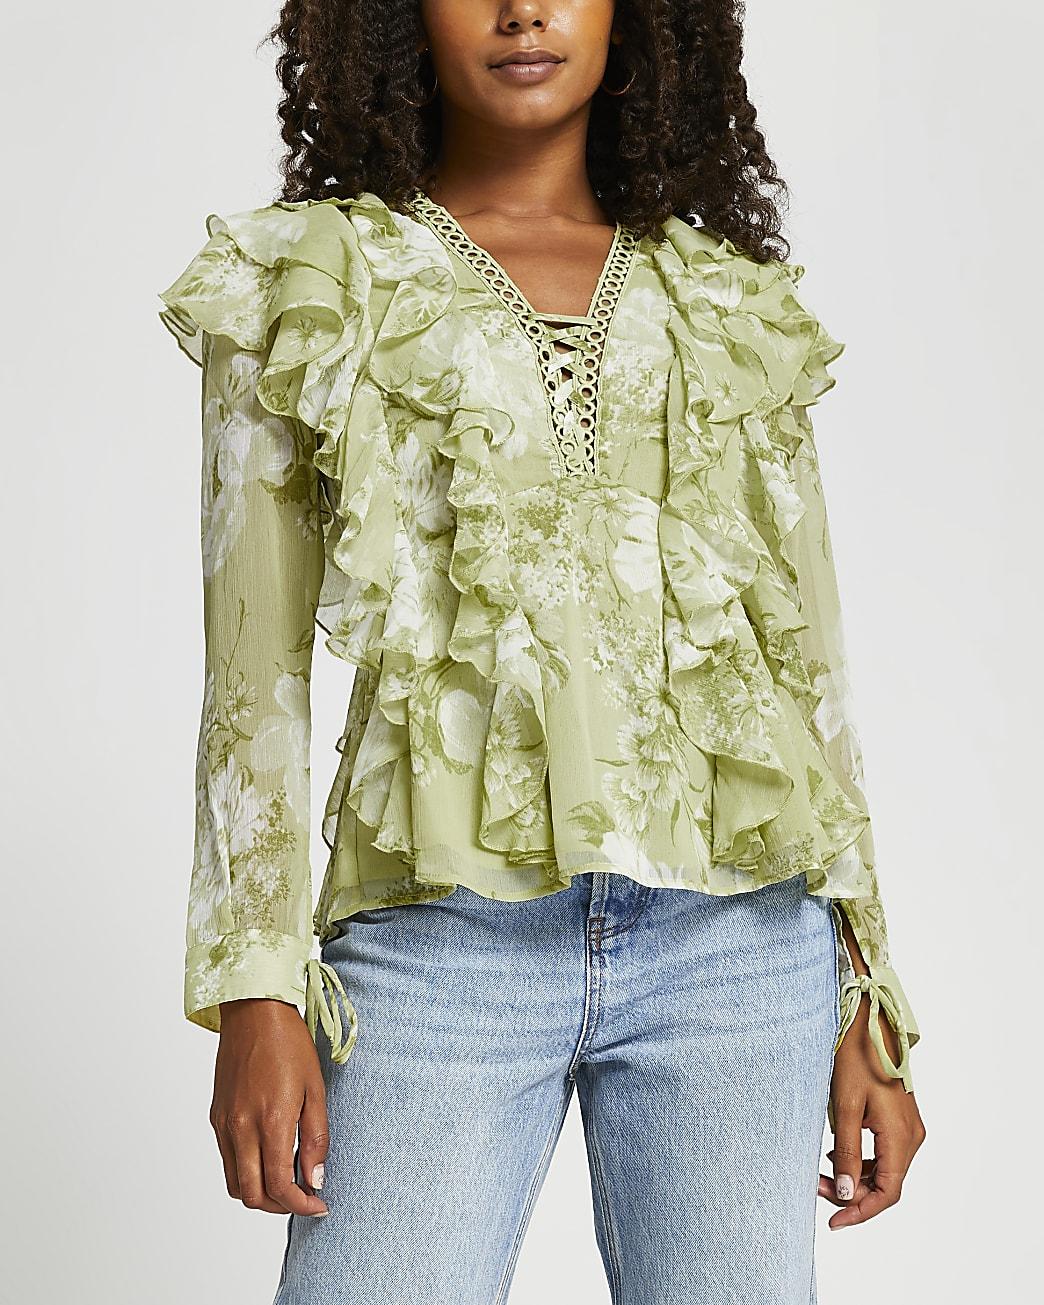 Green floral print ruffled blouse